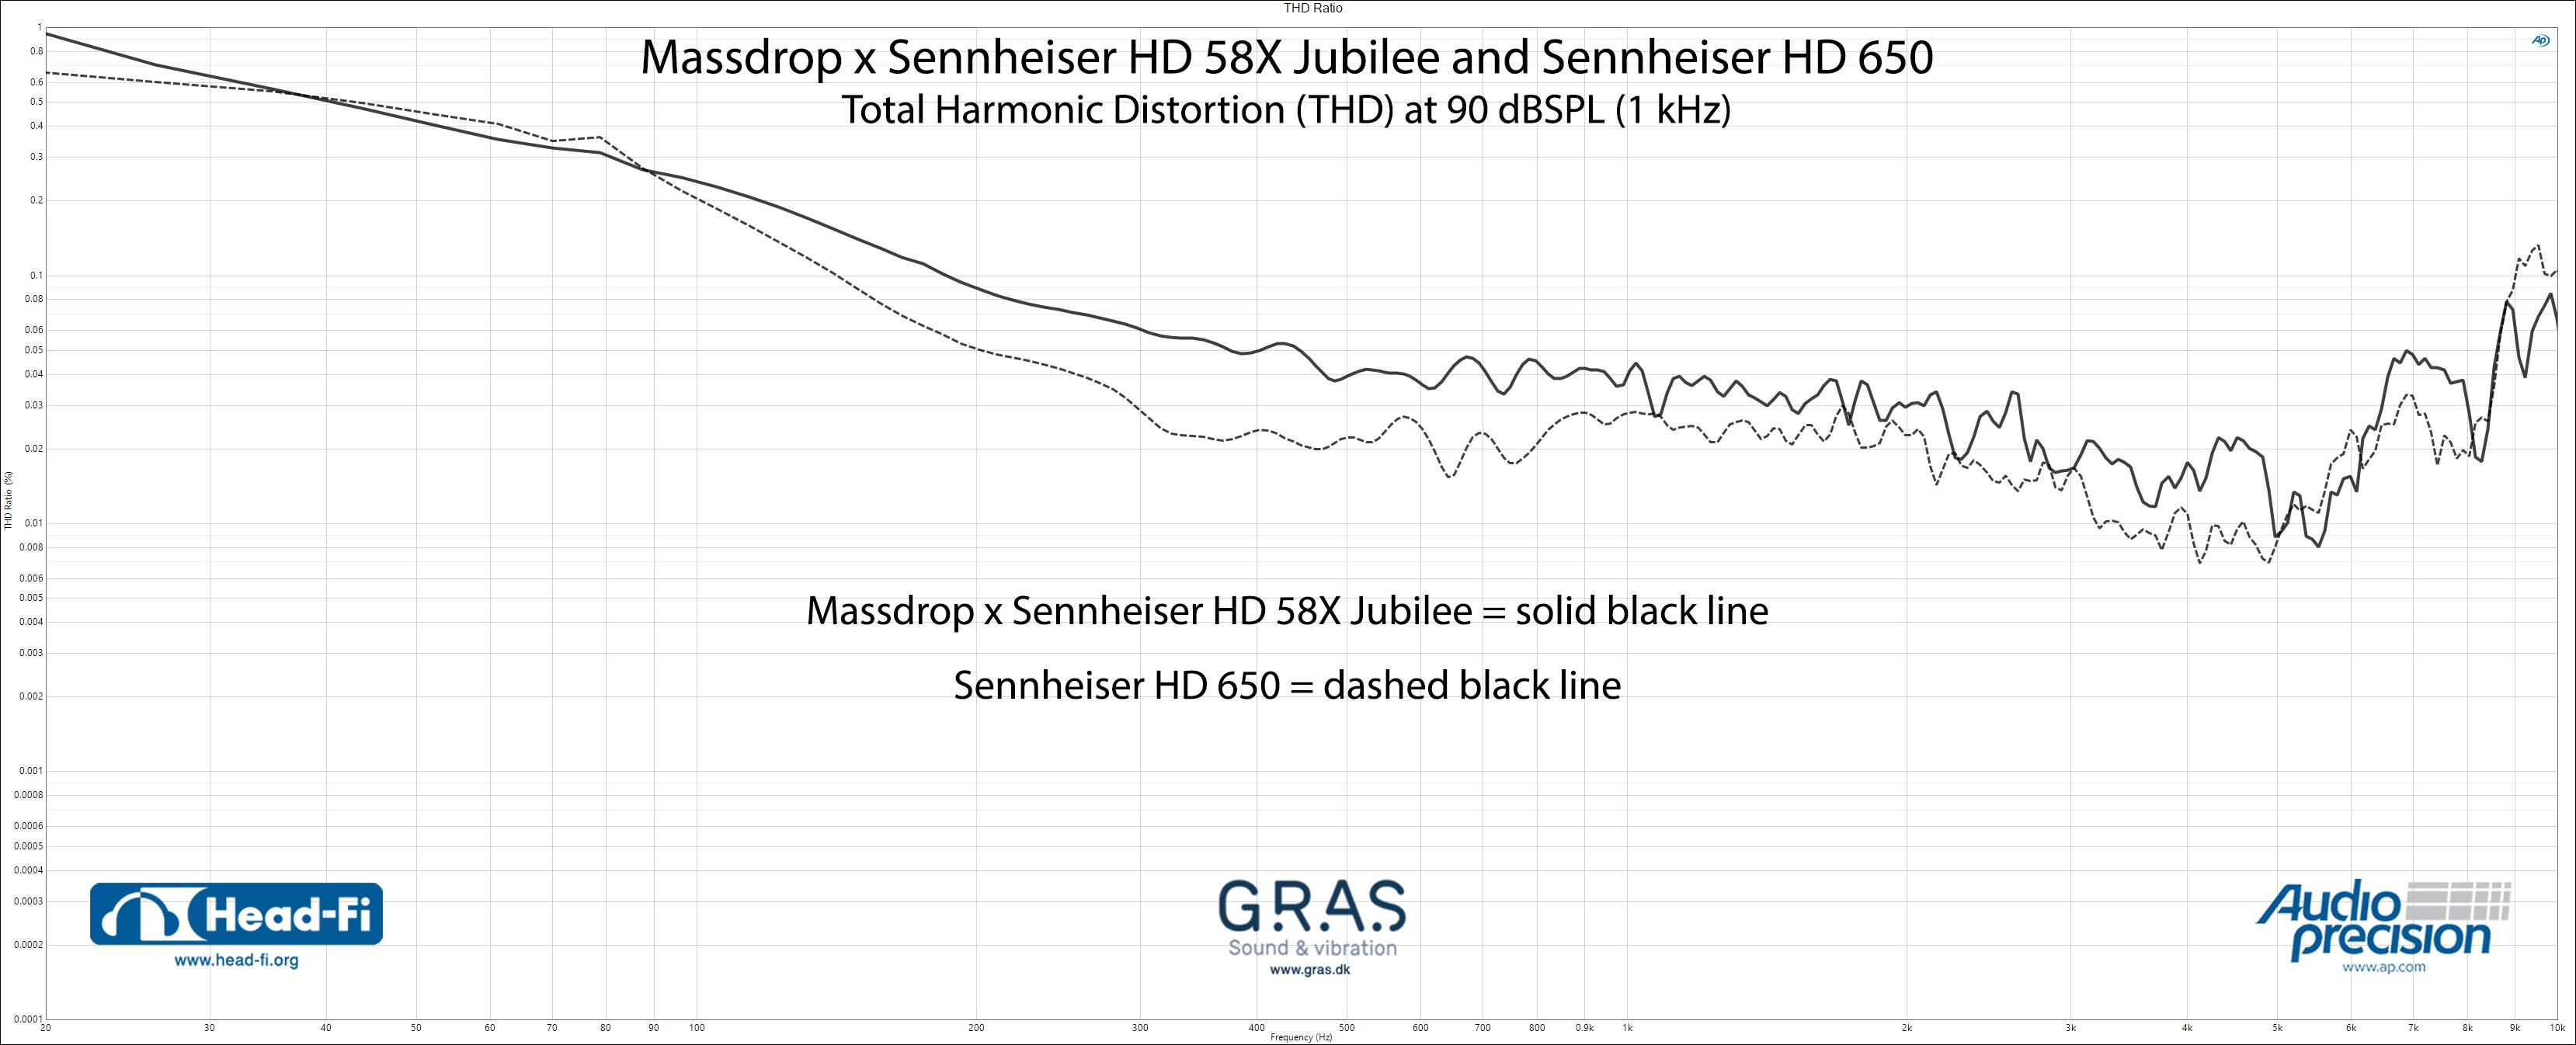 THD-Ratio---Massdrop-x-Sennheiser-HD58X-Jubilee---Sennheiser-HD650.jpg